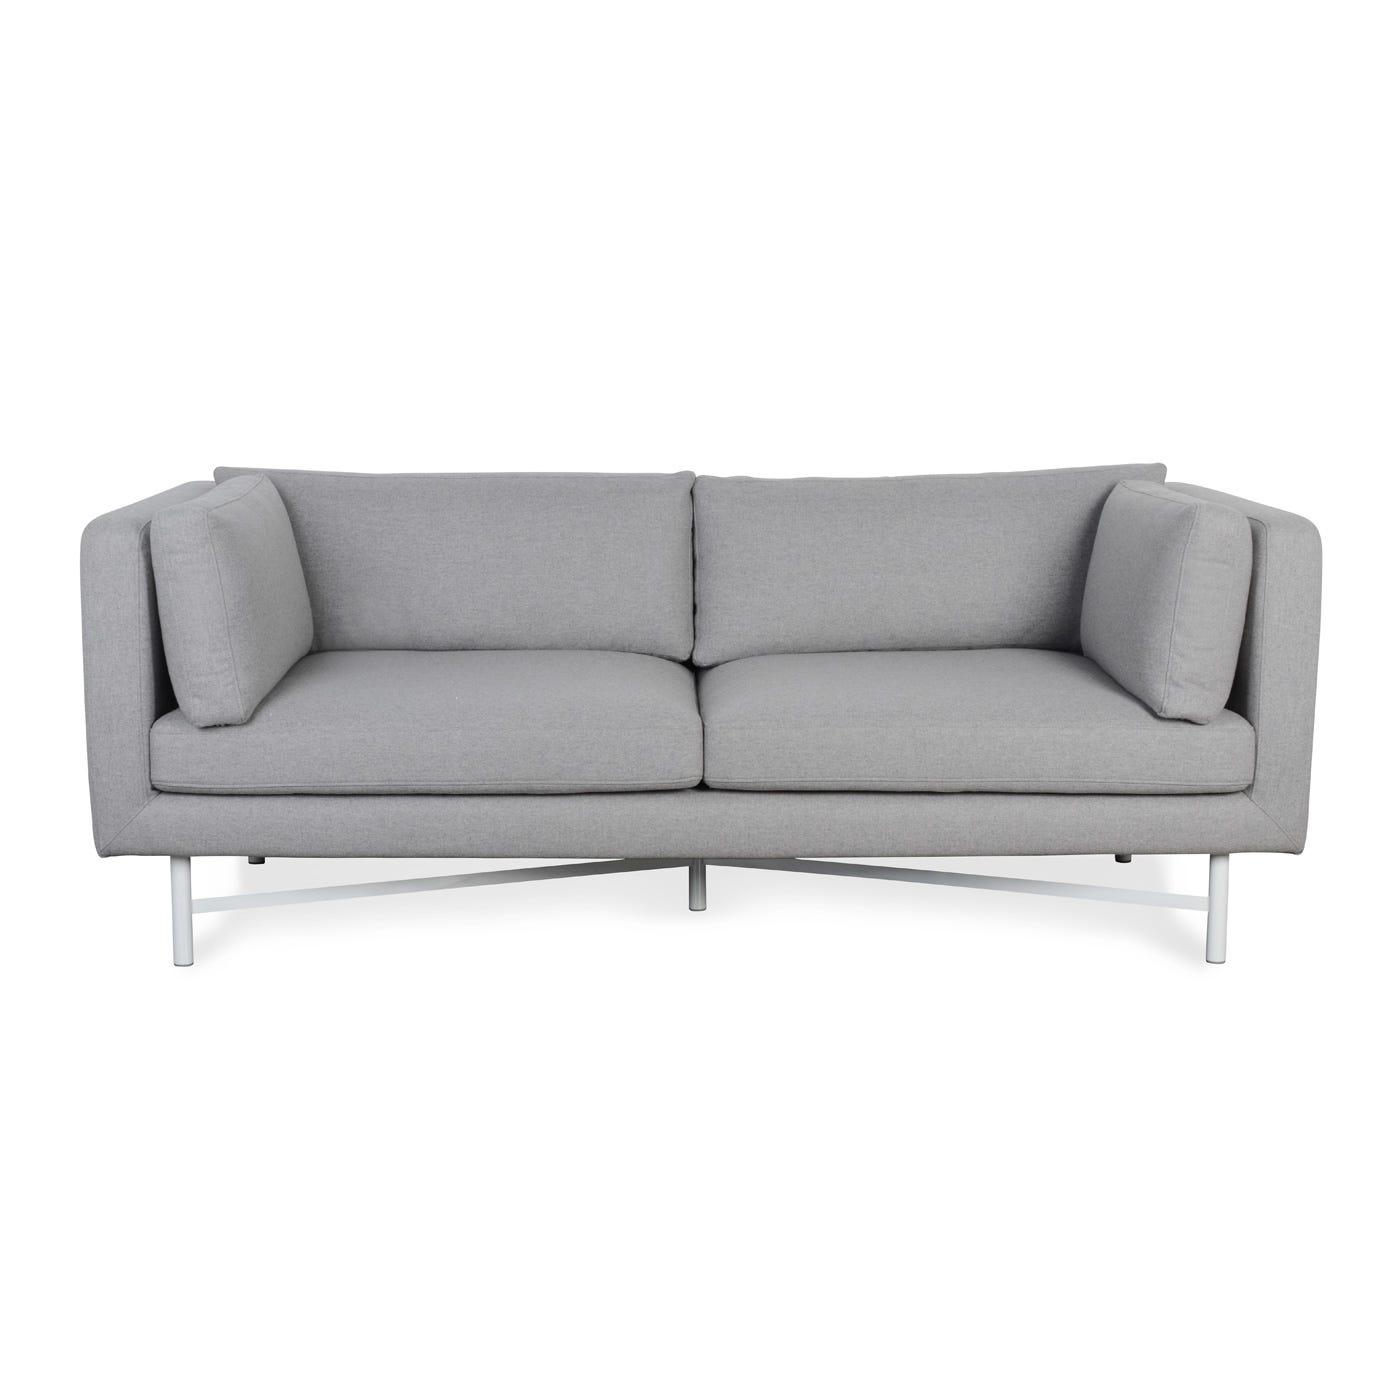 Dodie 3 Seater Sofa Wool Felt Flint - Warehouse Sale